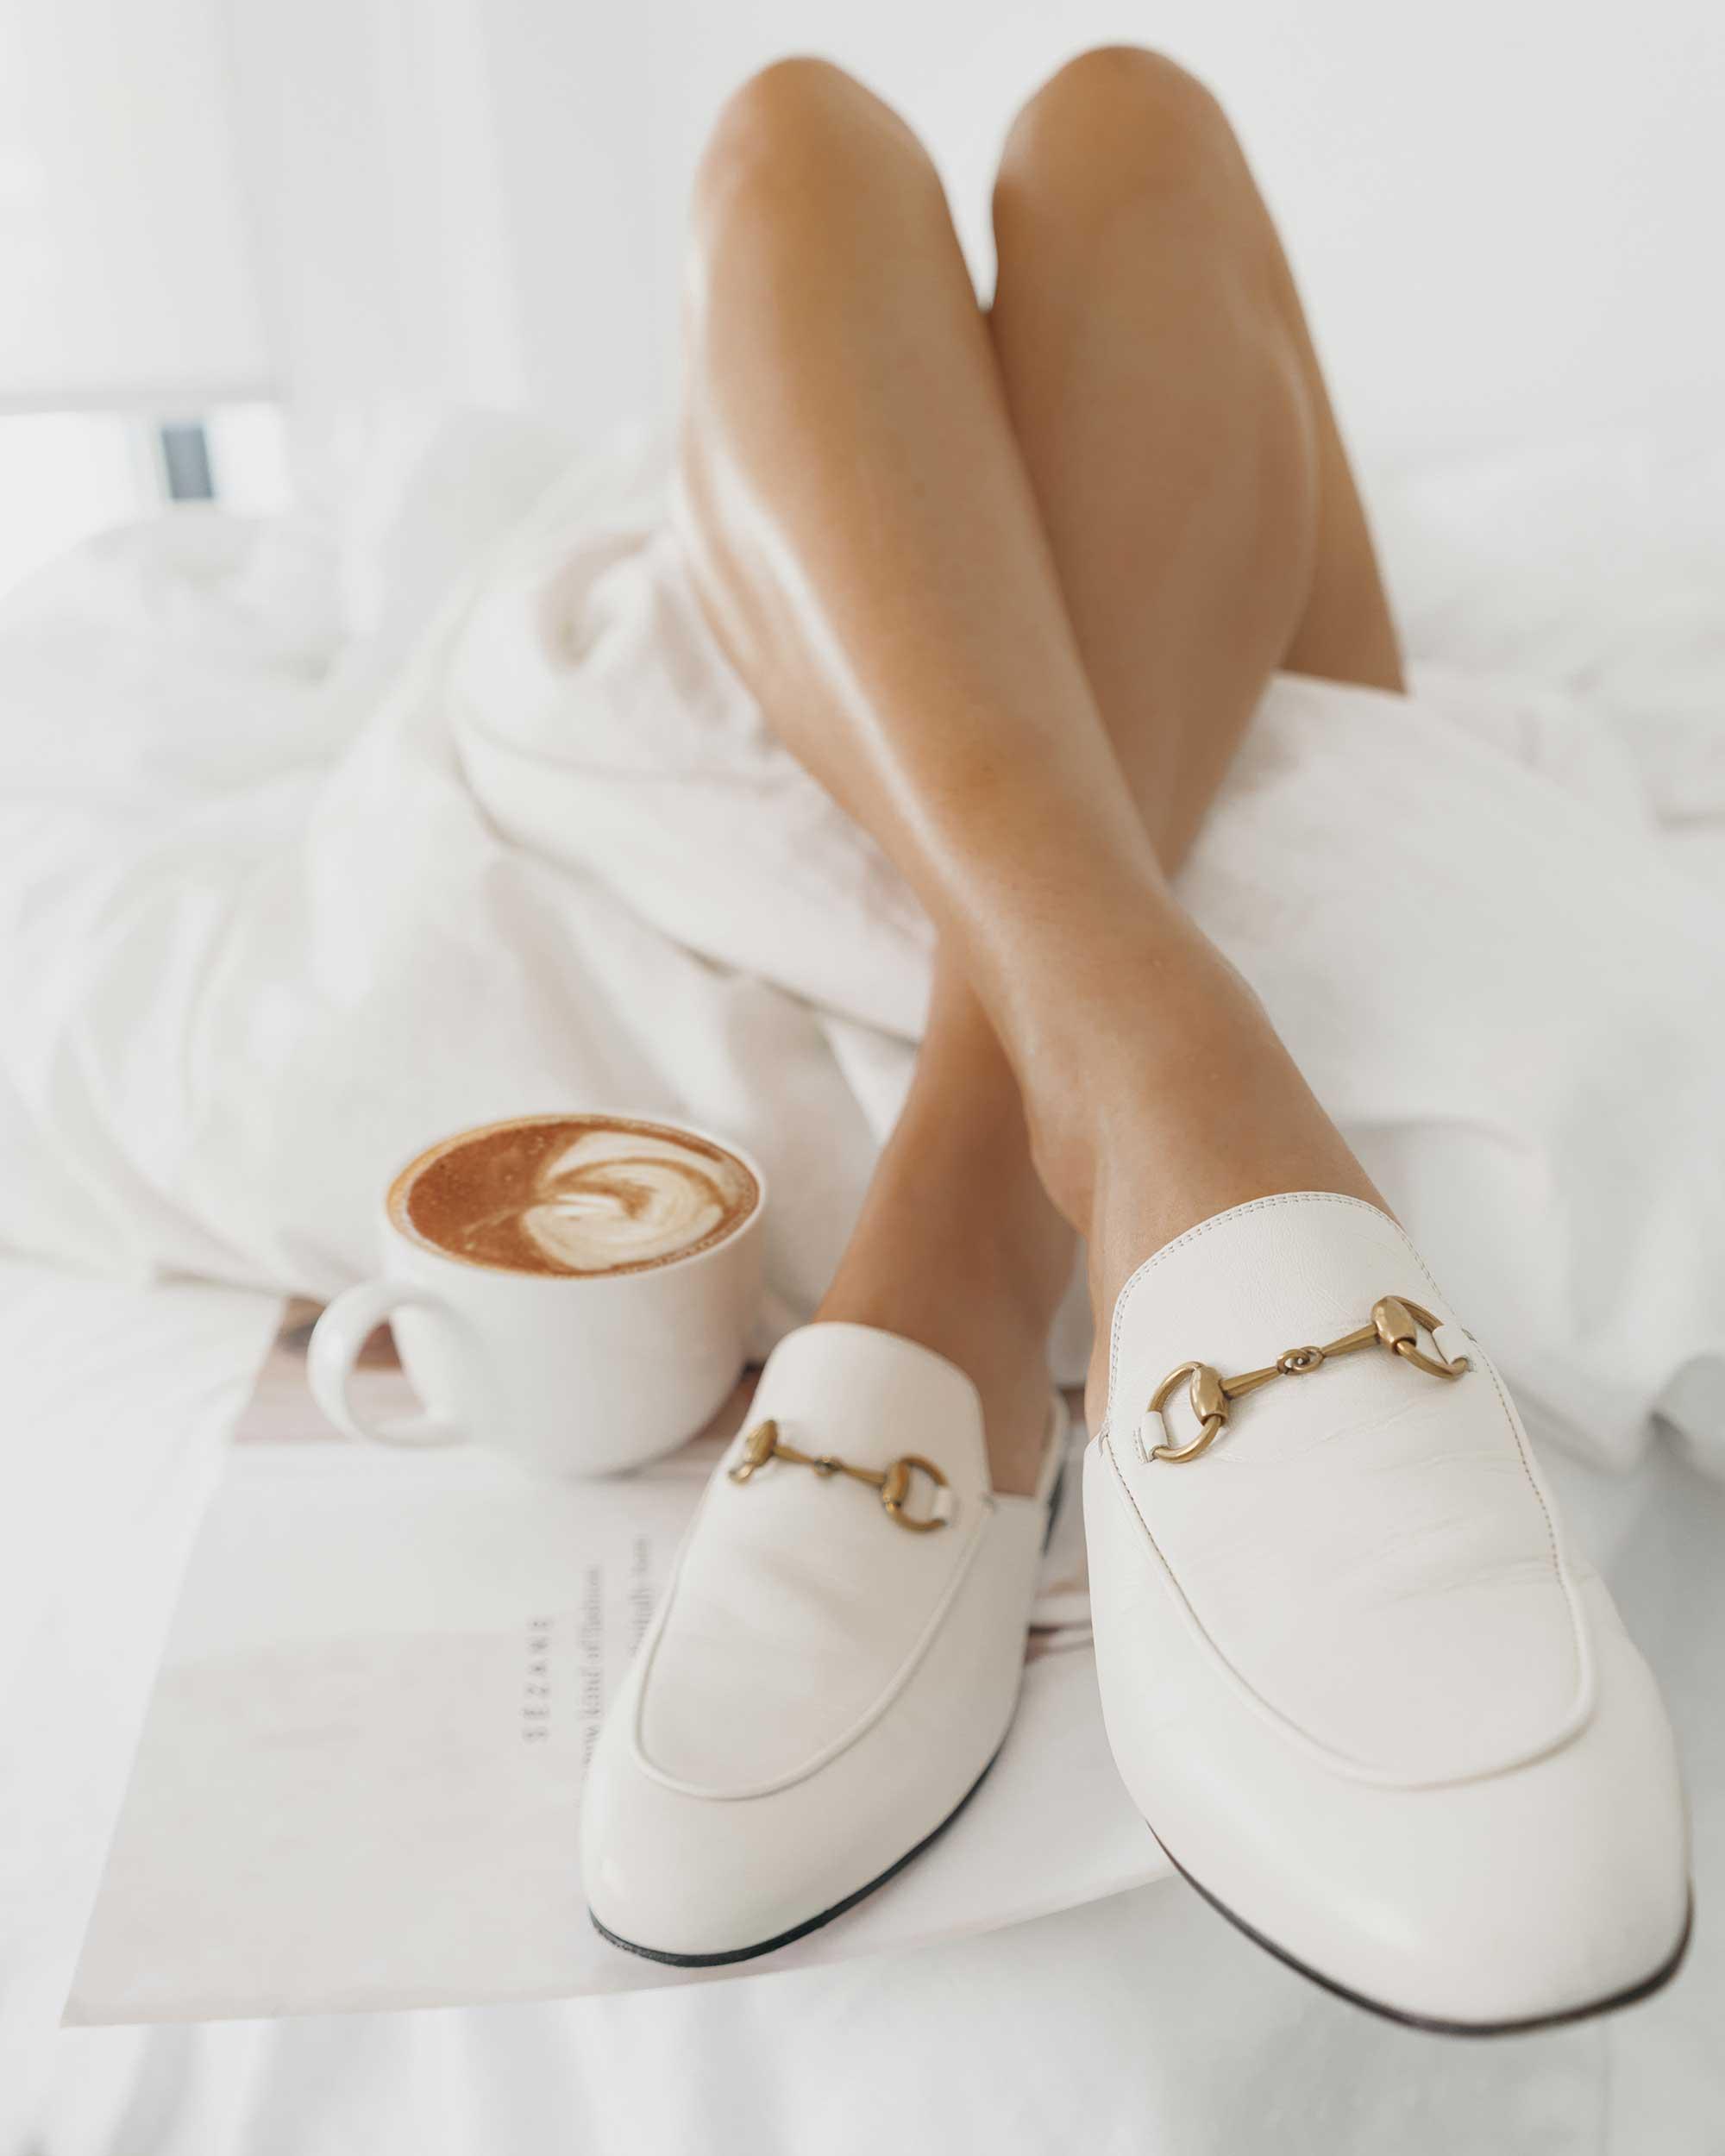 White Gucci Princetown Leather Slipper2.jpg